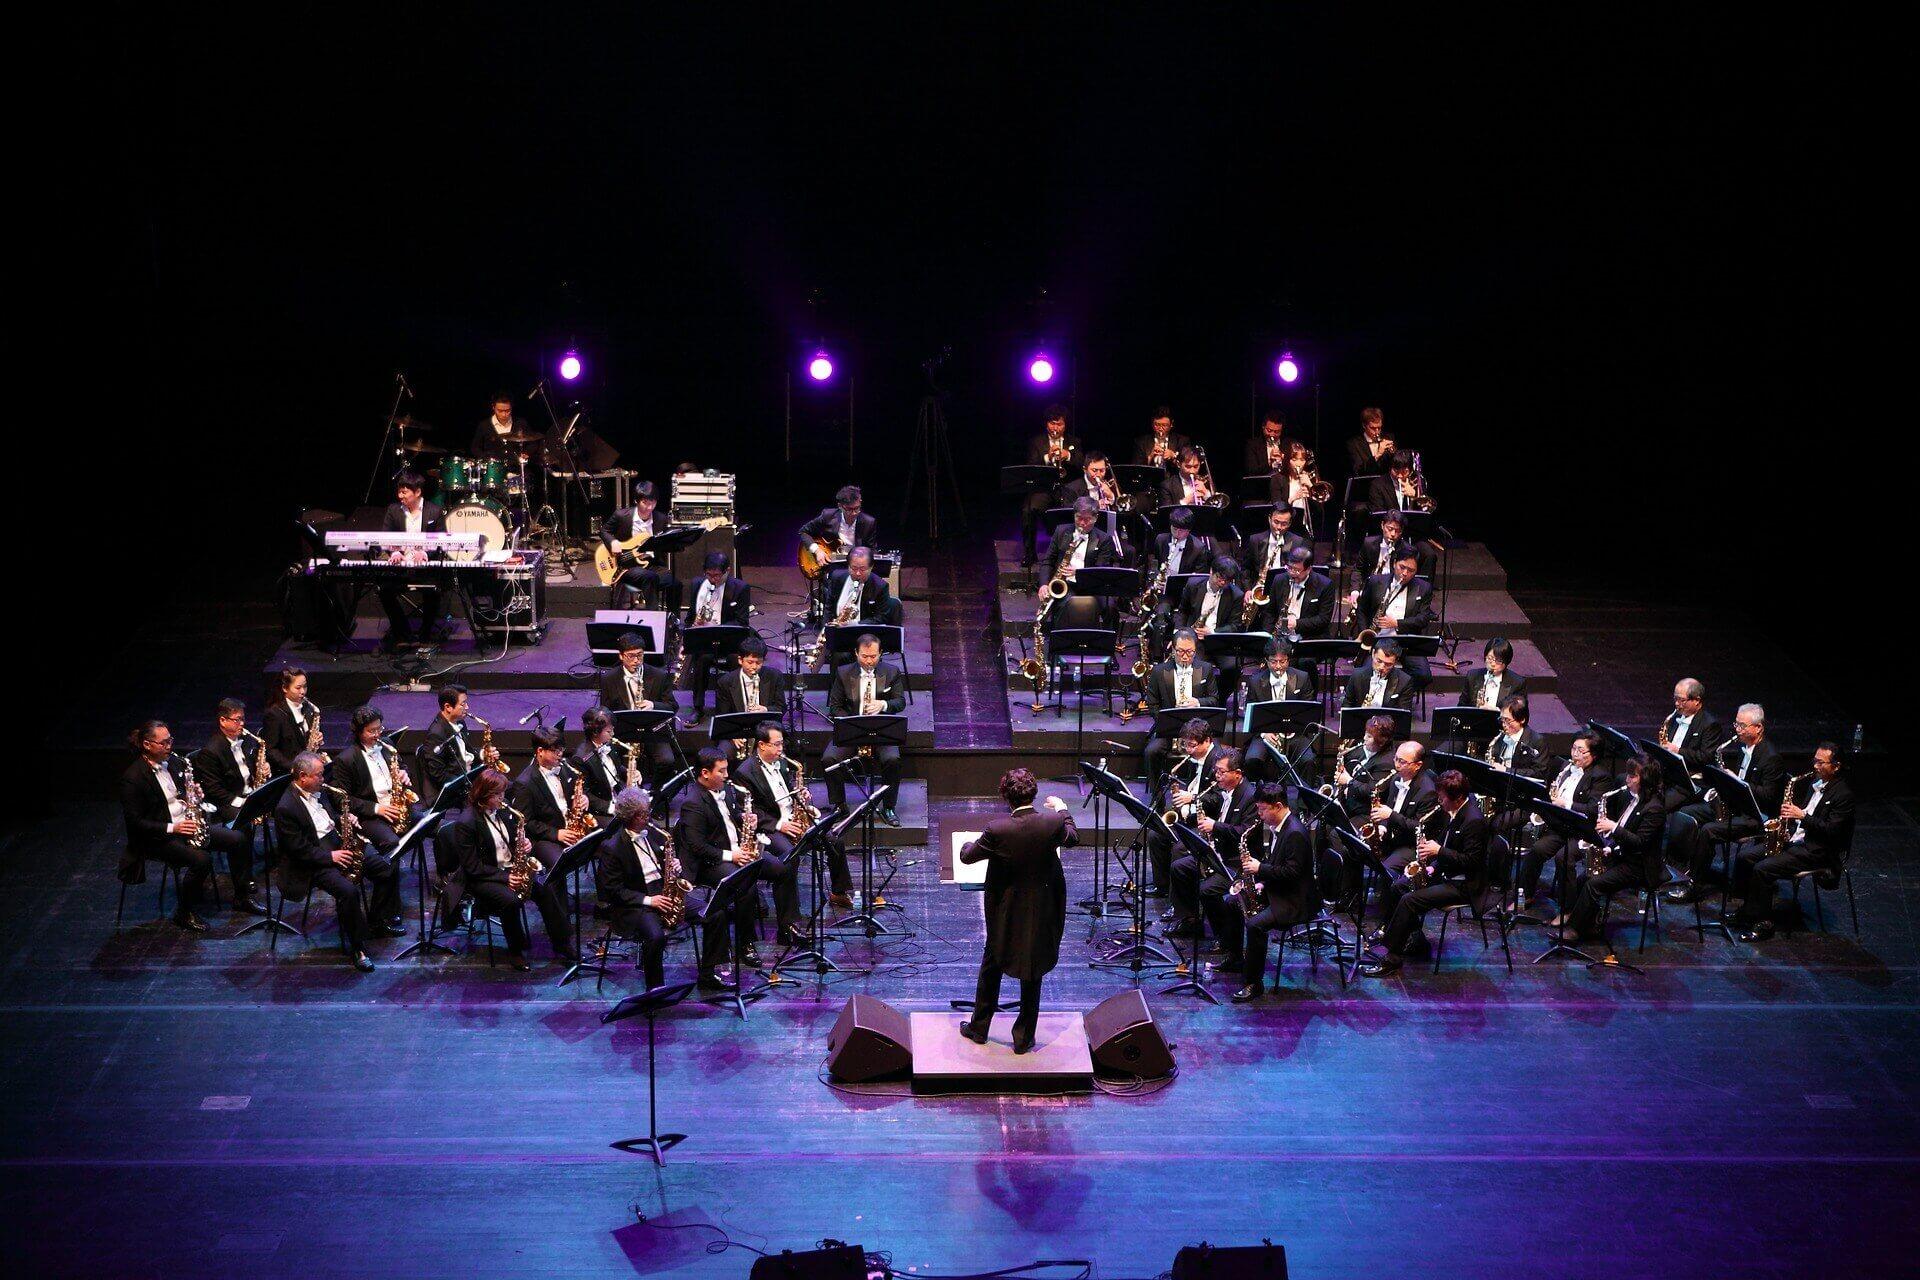 Musik Orchester (c) yunje5054 / pixabay.de